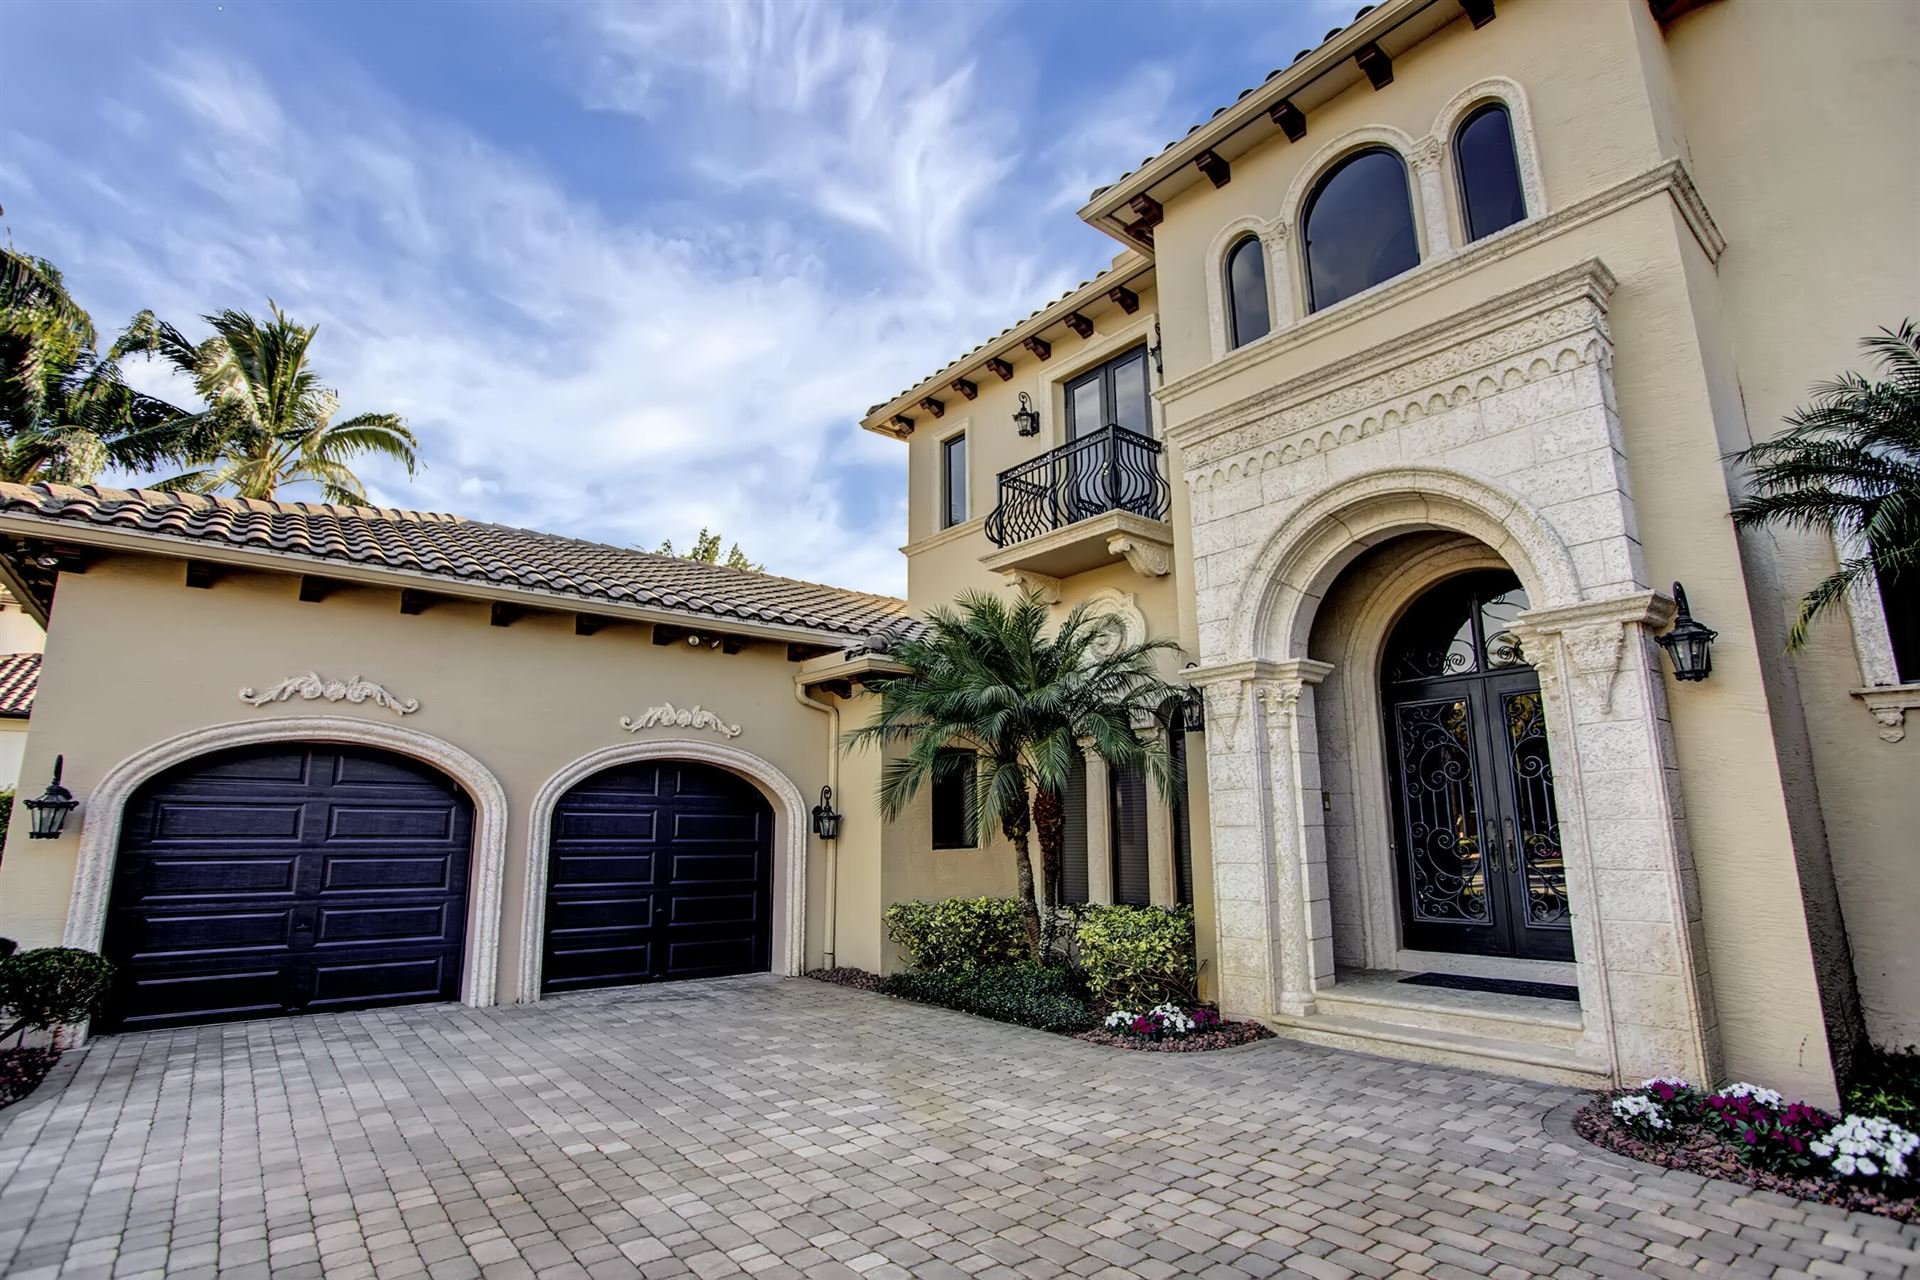 Photo of 9537 Grand Estates Way, Boca Raton, FL 33496 (MLS # RX-10696133)